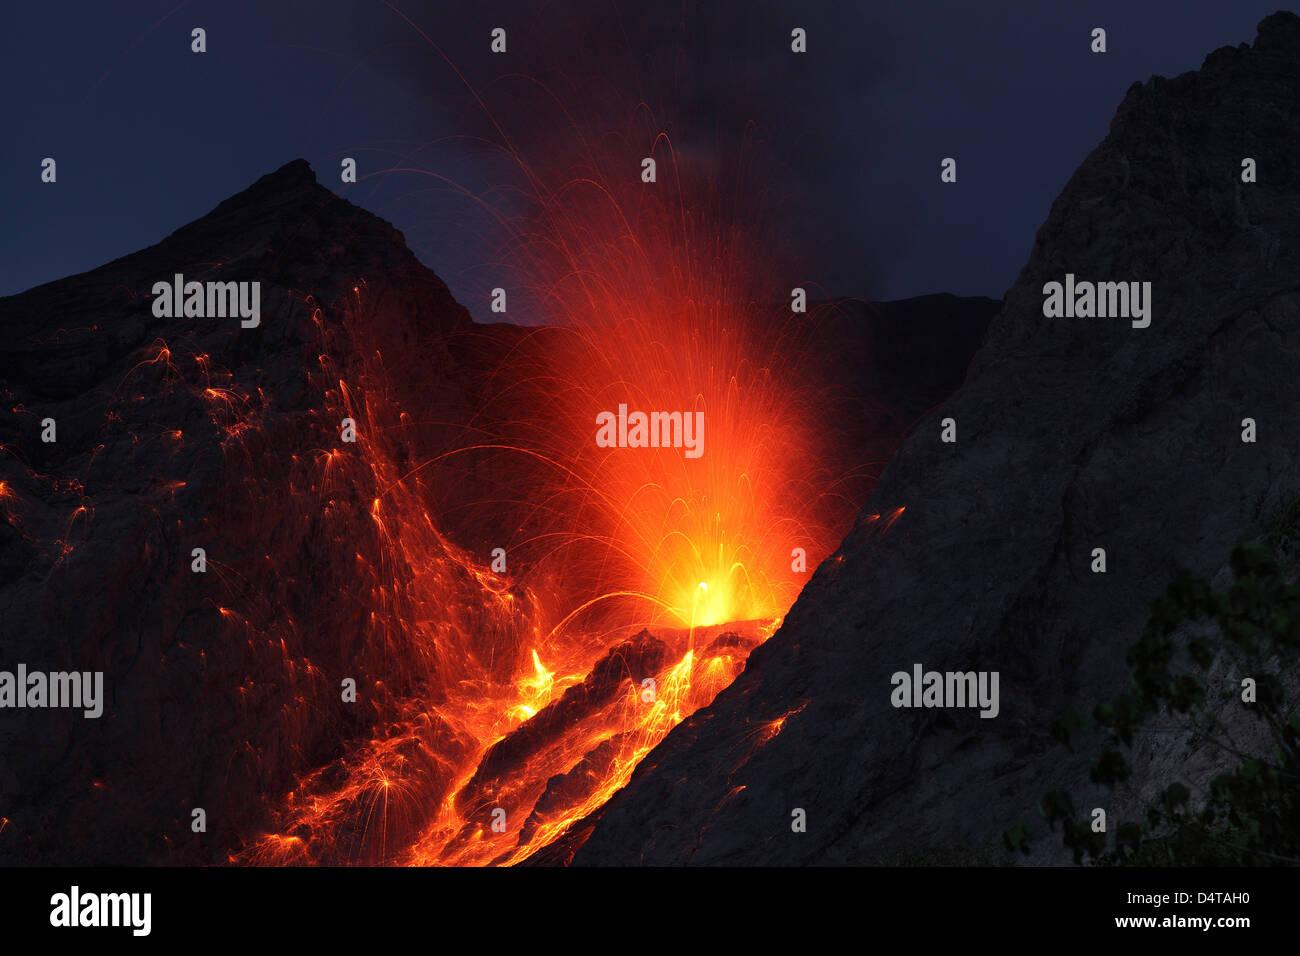 Strombolian type eruption of Batu Tara volcano, Indonesia. Stock Photo